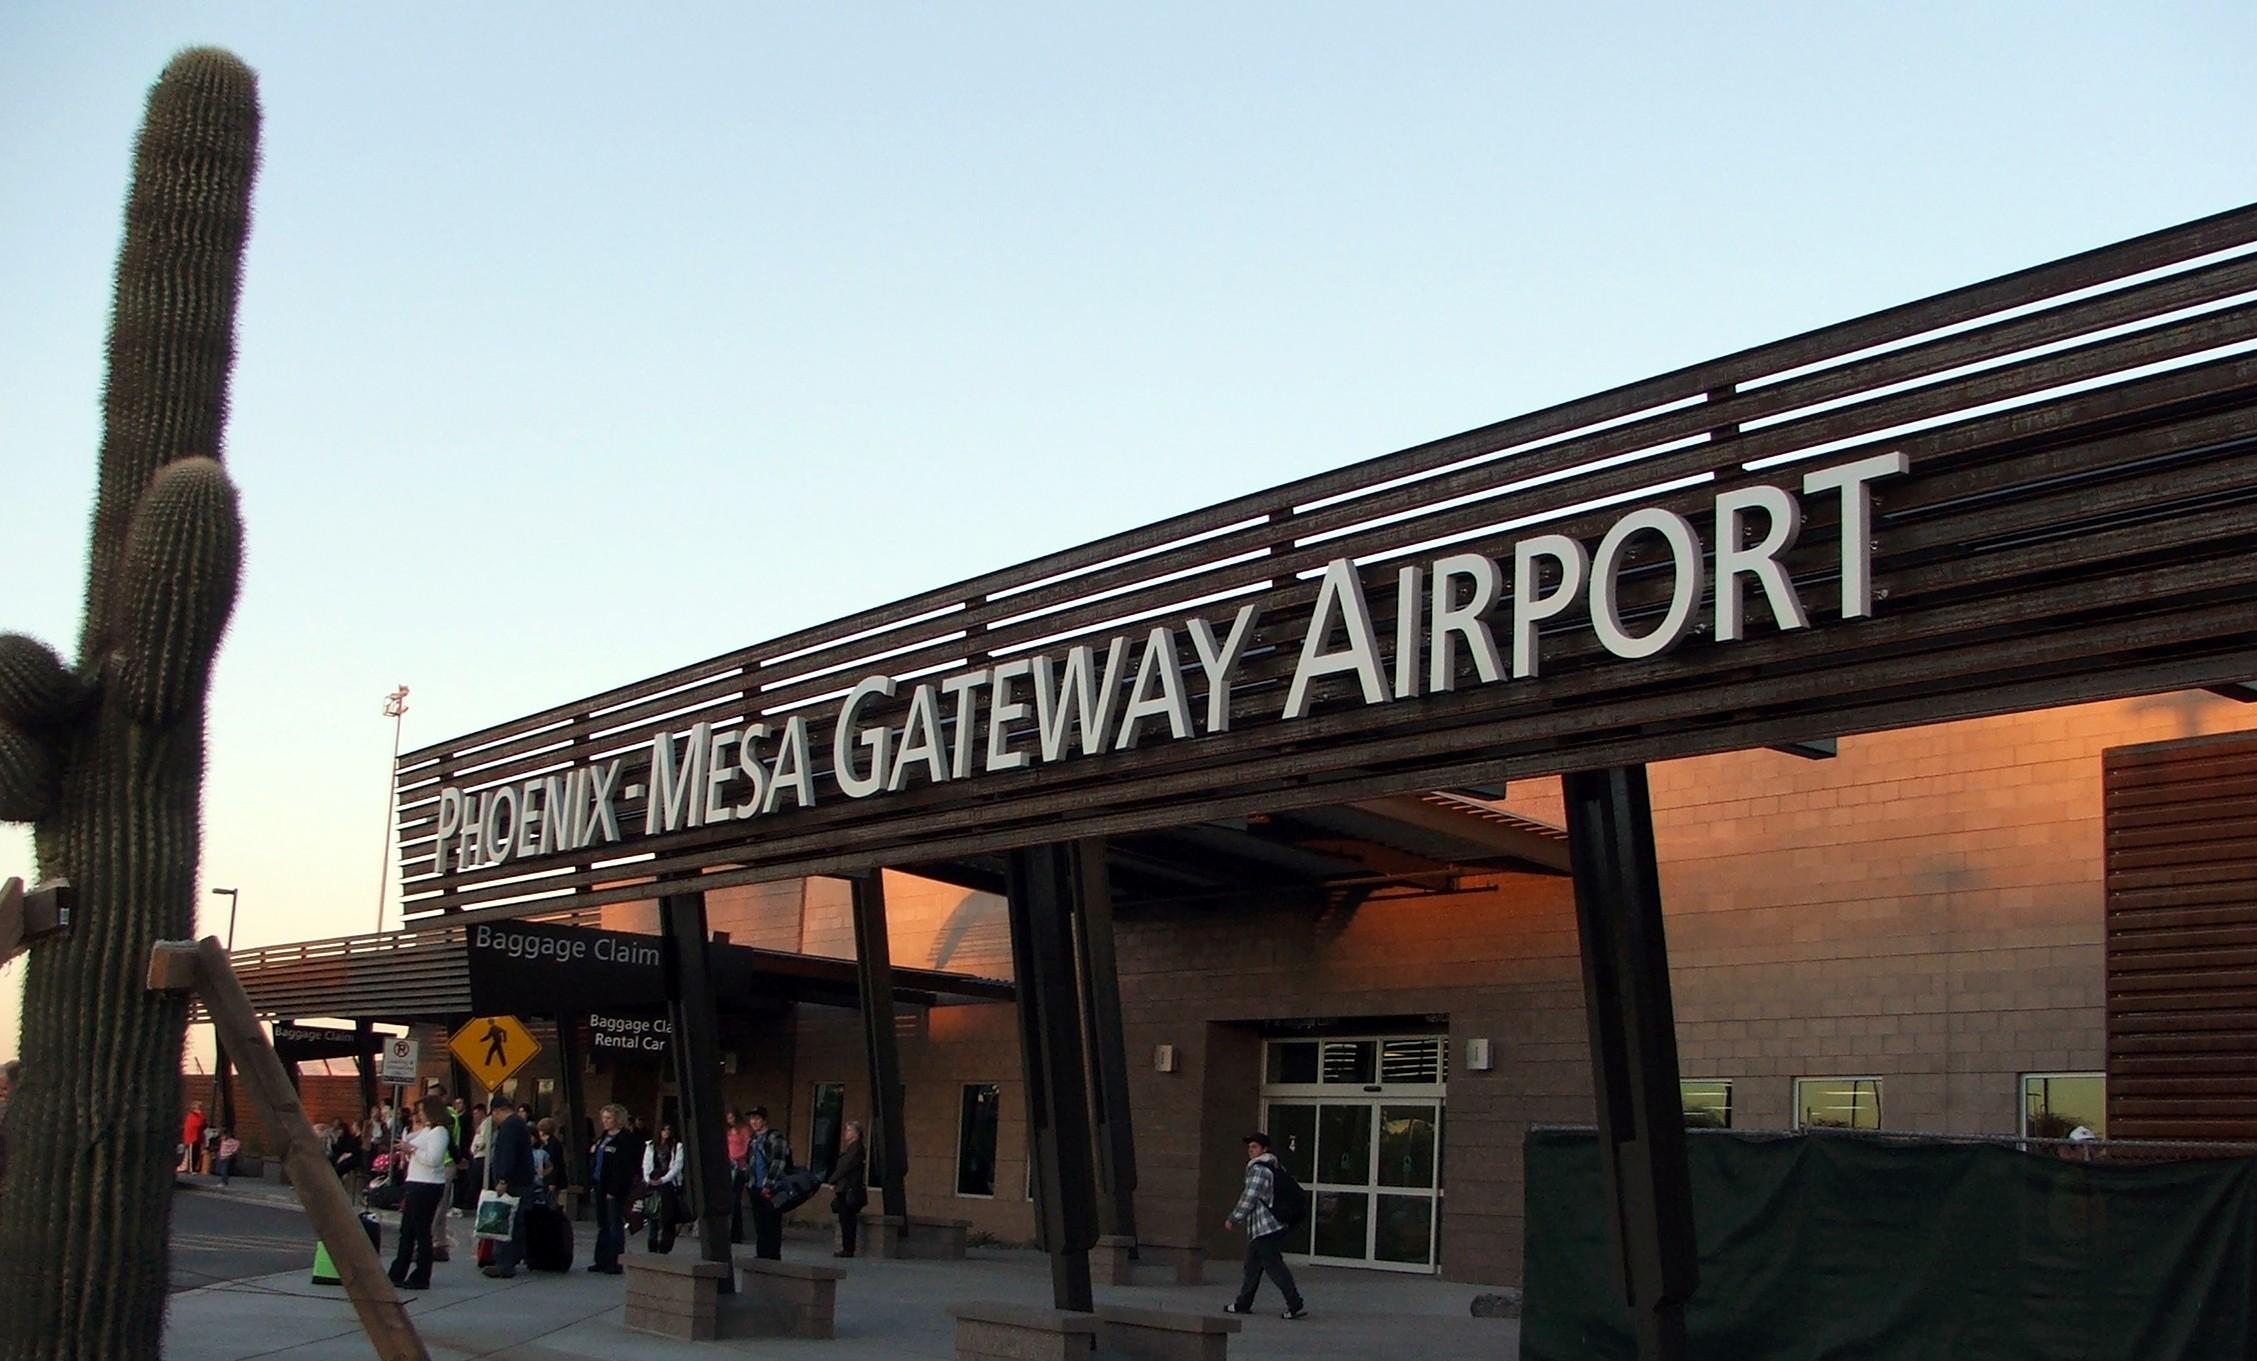 Phx-Mesa-Gateway-Terminal-Sign